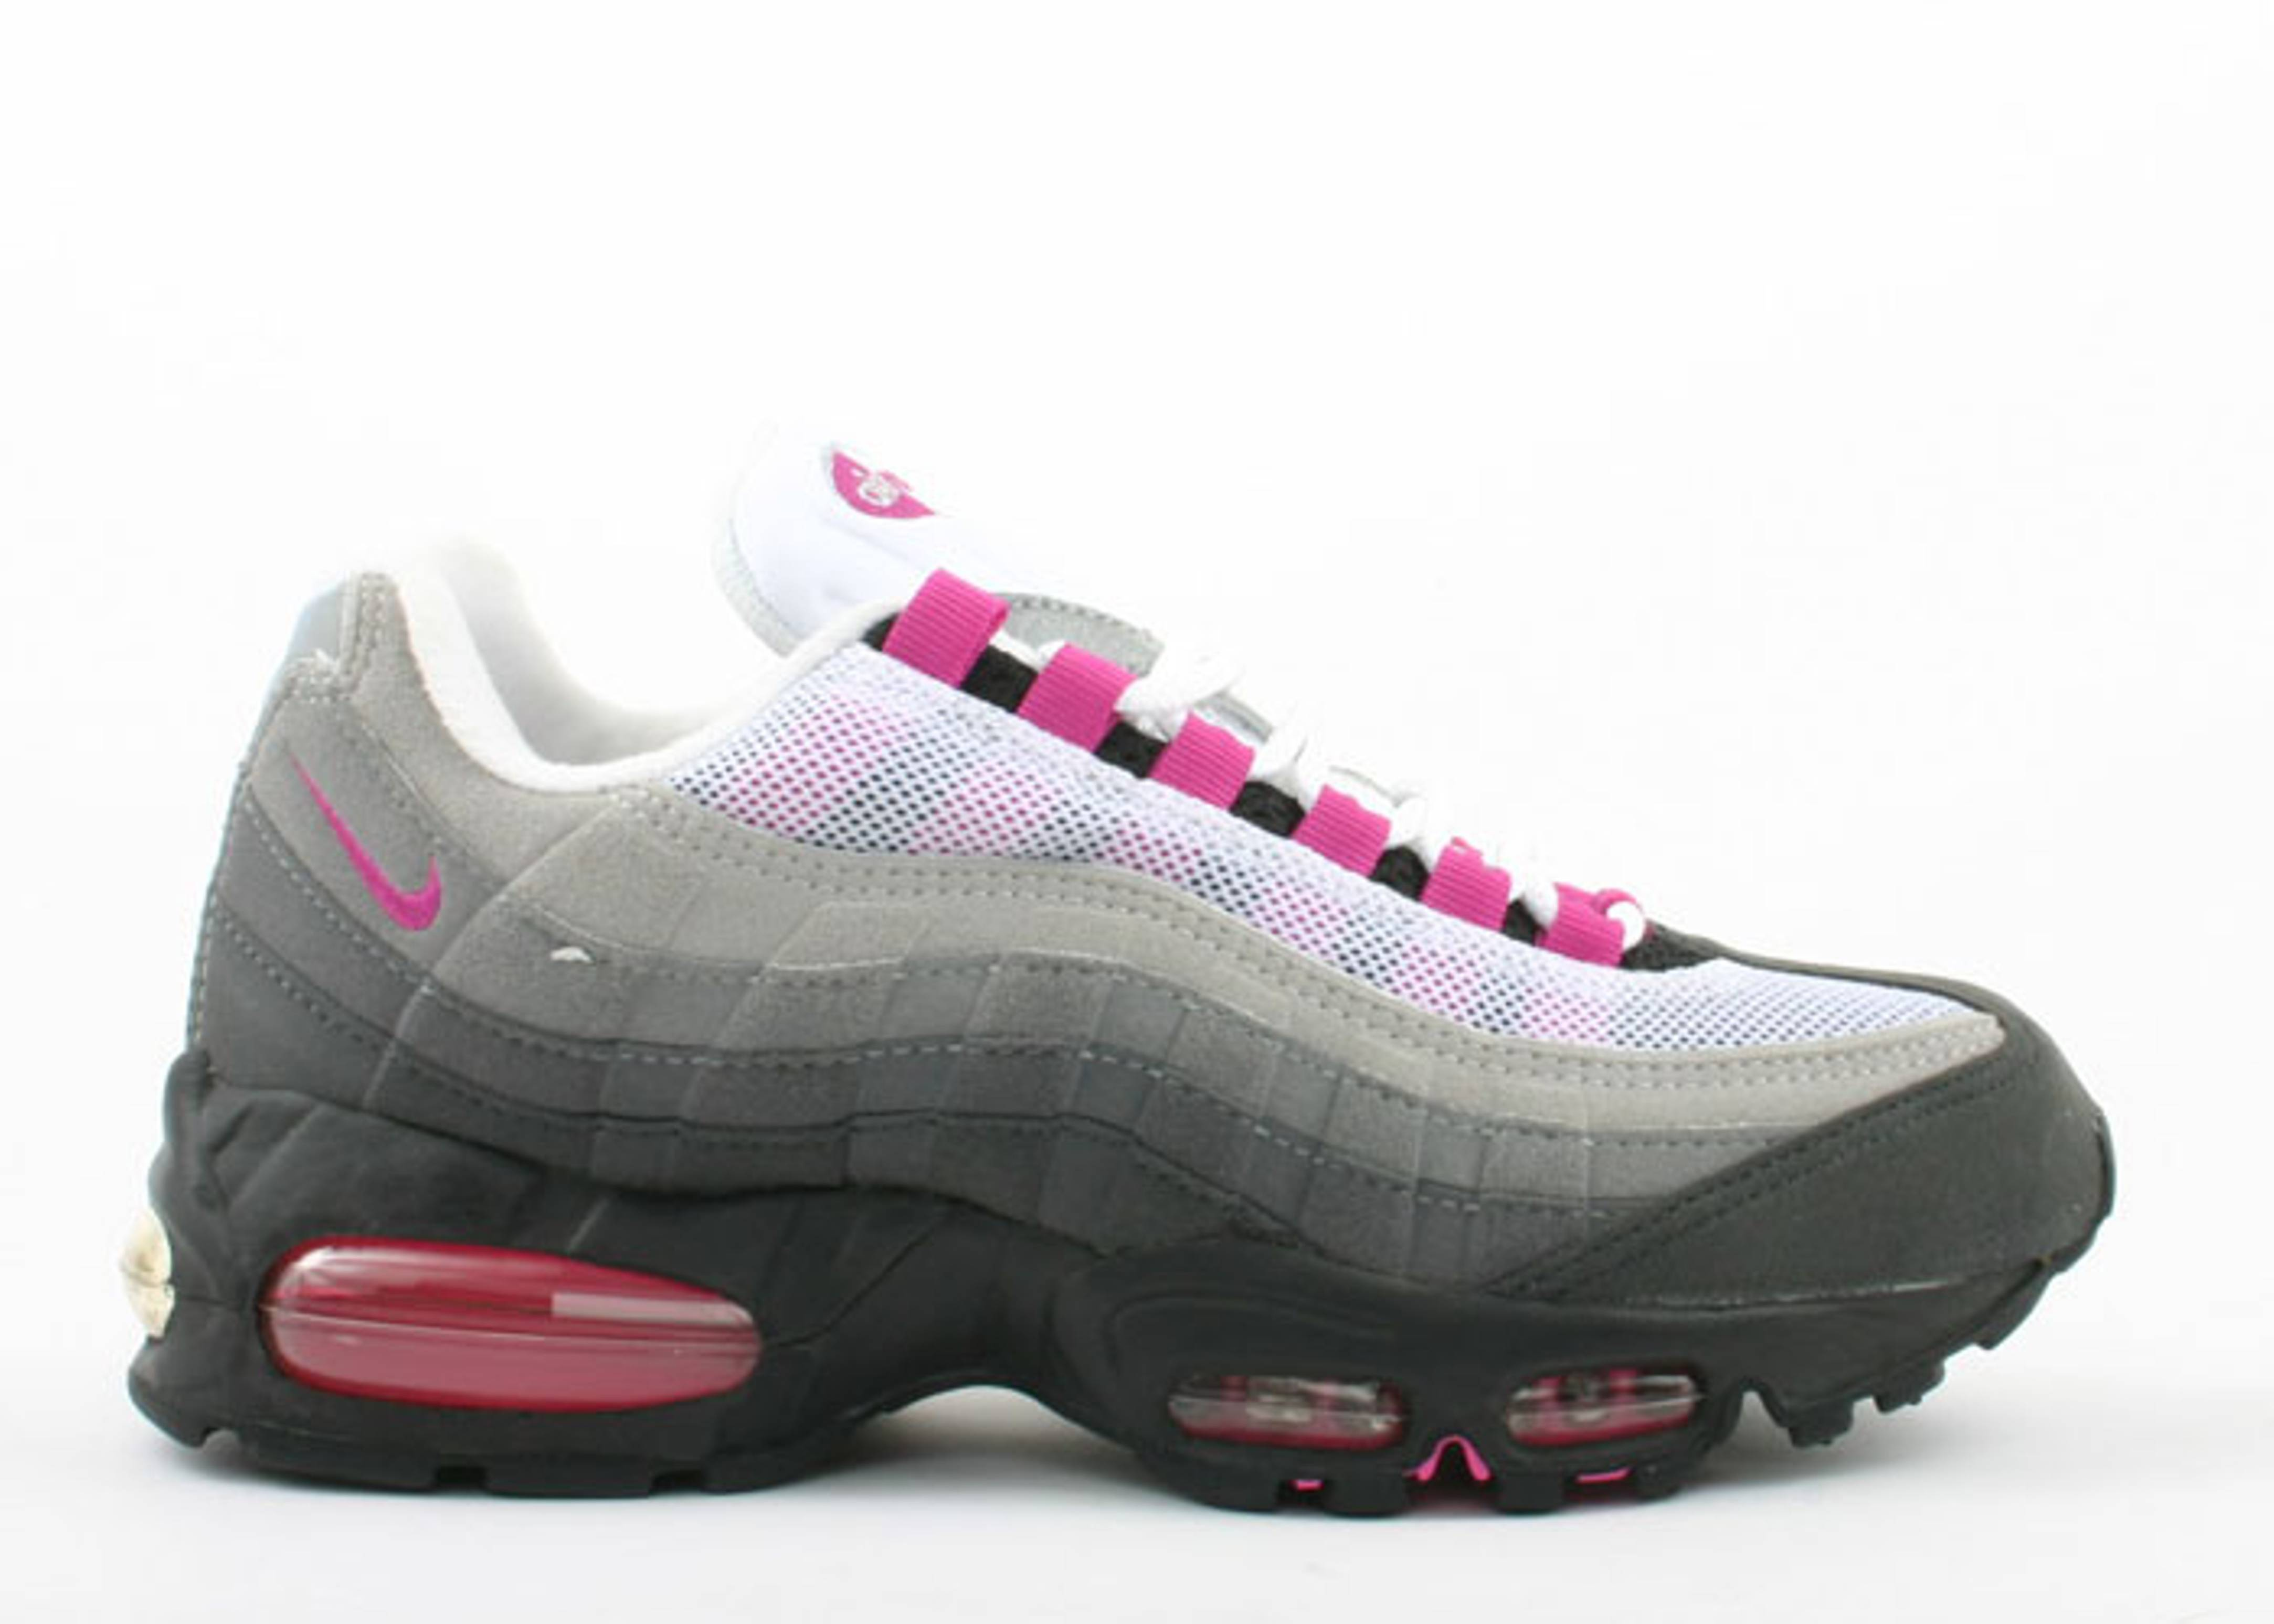 nike air max 95 black and pink